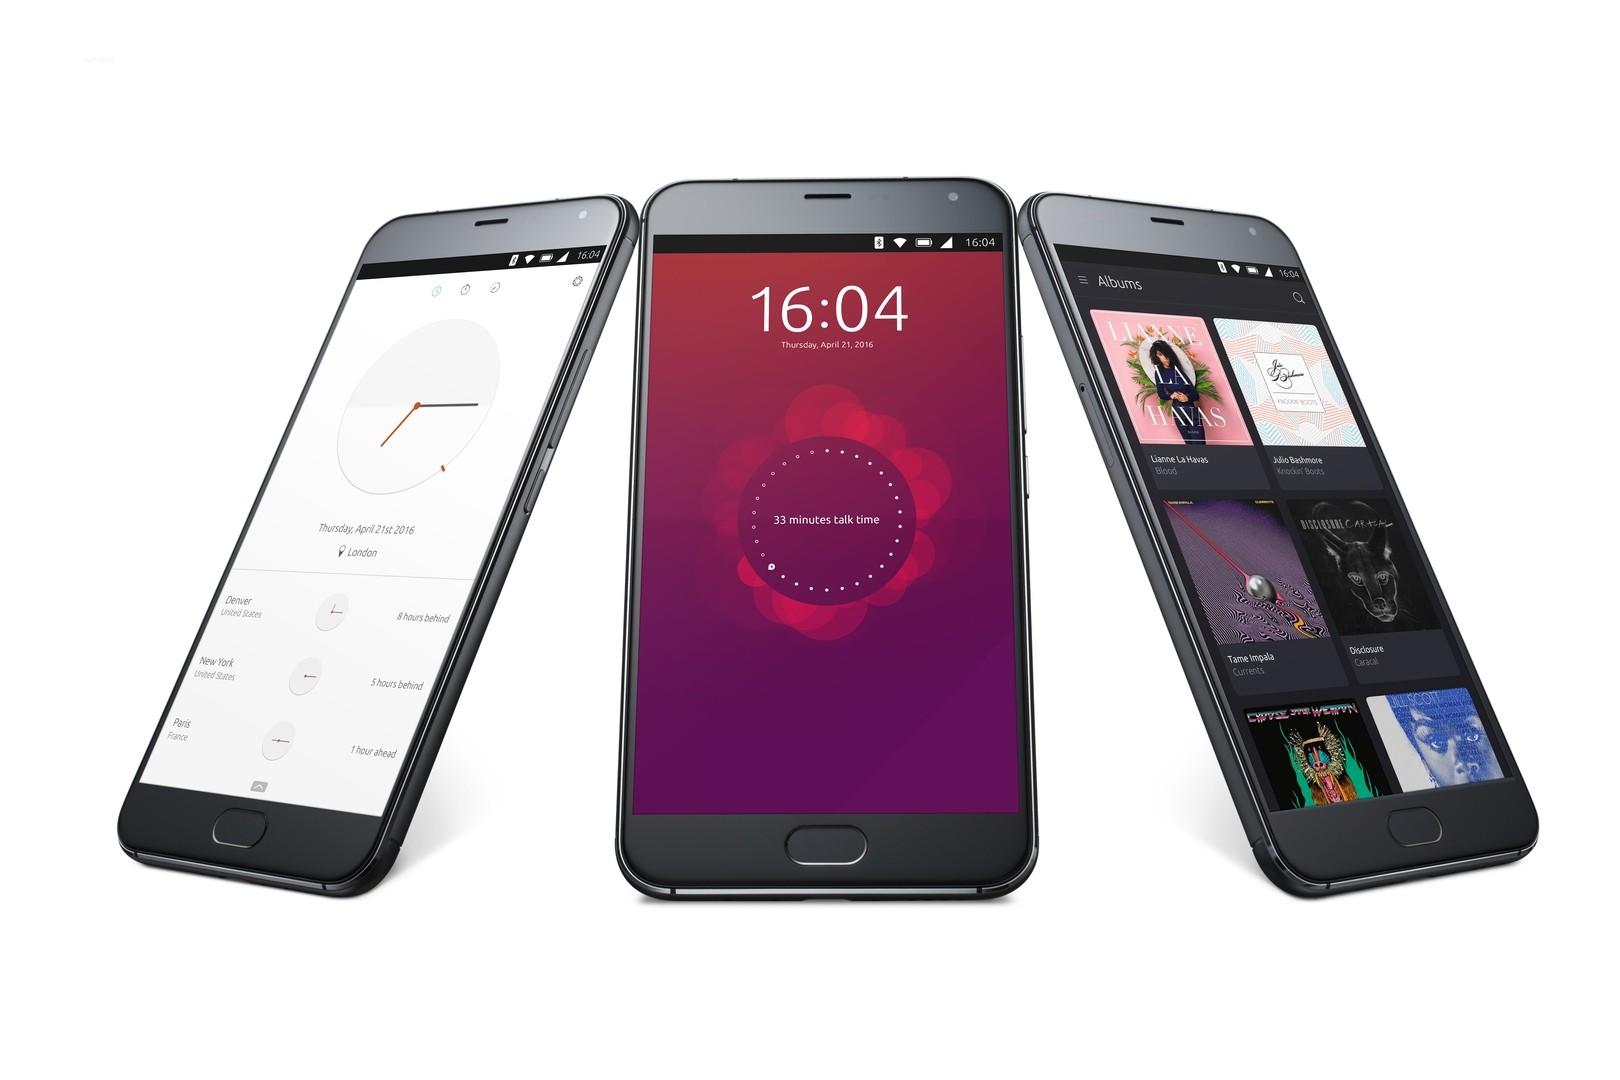 Biometric Authentication Might Come to Some Ubuntu Phones in Future OTAs